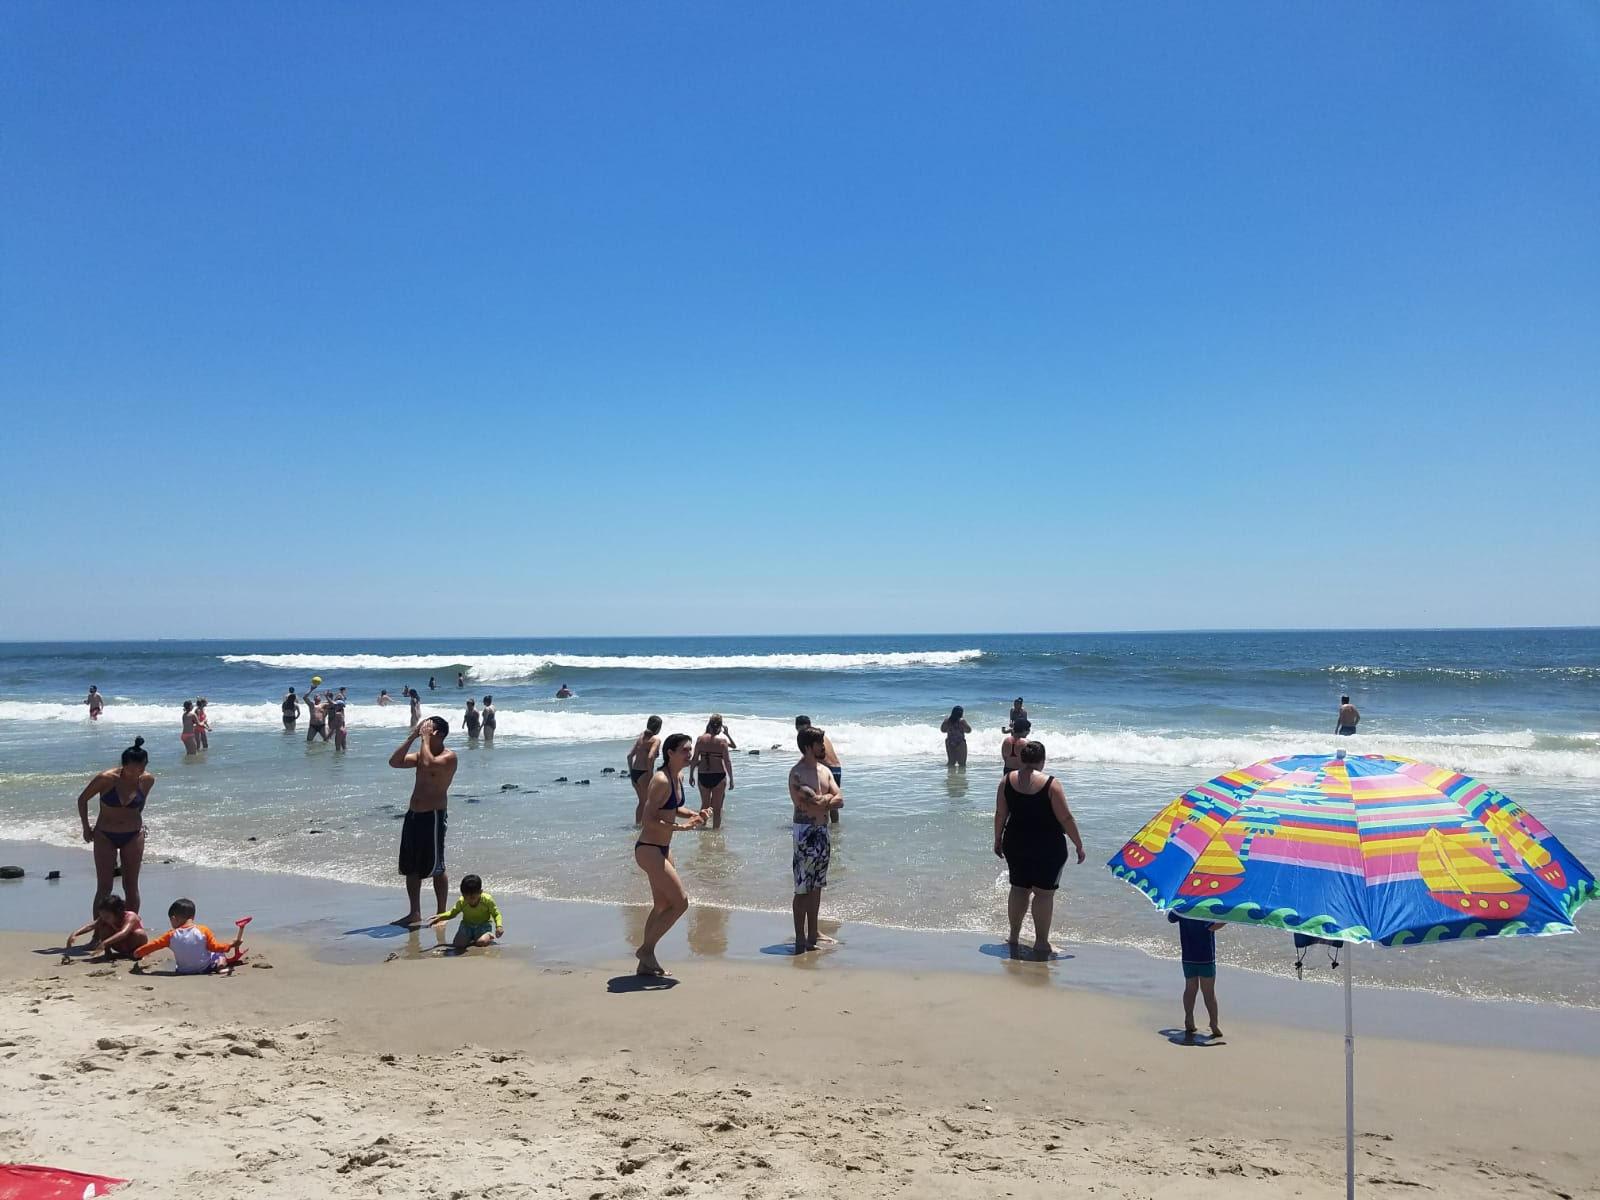 Swimmers and sunbathers pack Rockaway Beach. Photo by Zach Hoffman.